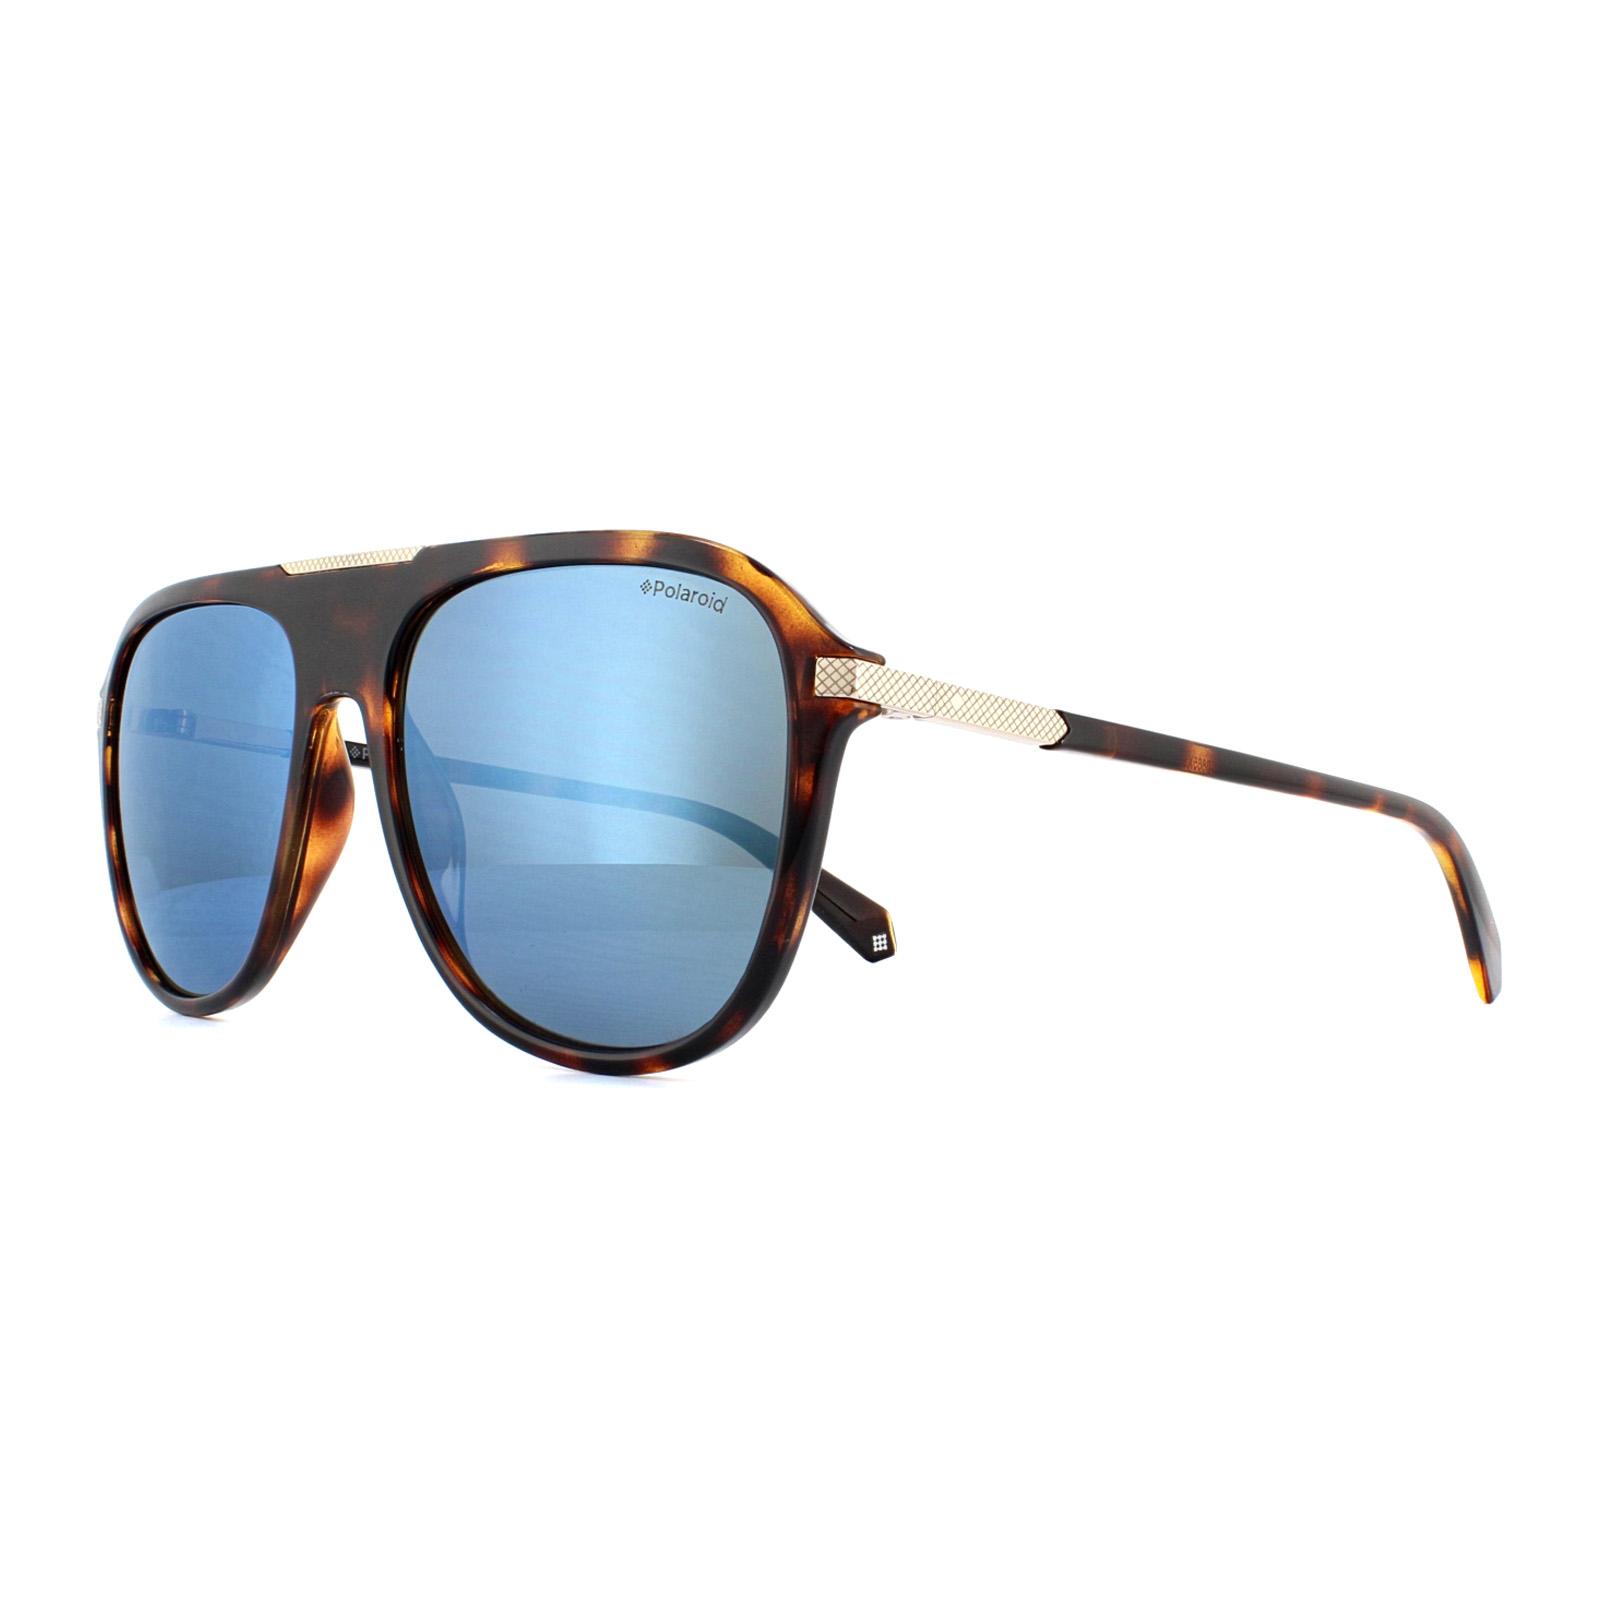 5be3be0247d Sentinel Polaroid Sunglasses PLD 2070 S X 086 5X Dark Havana Grey Blue  Mirror Polarized